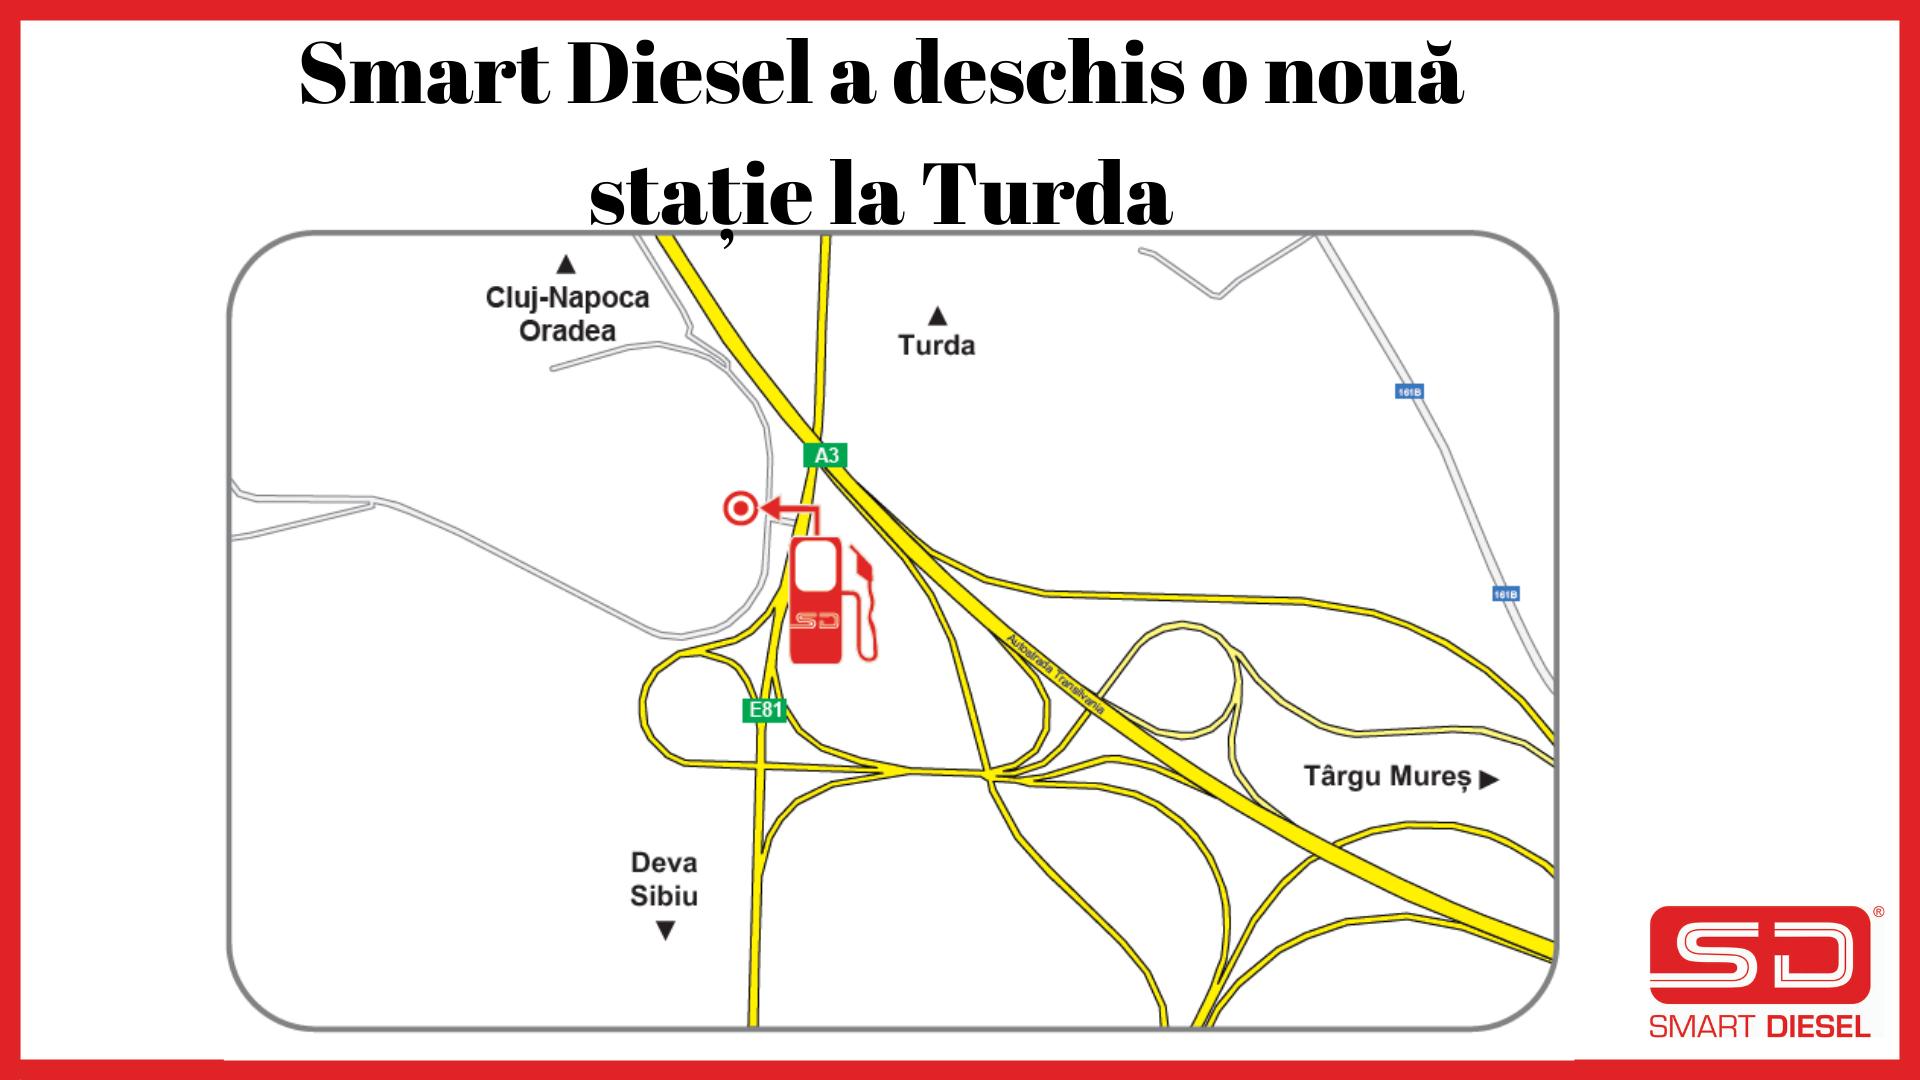 Smart Diesel isi extinde reteaua cu o noua statie la Turda